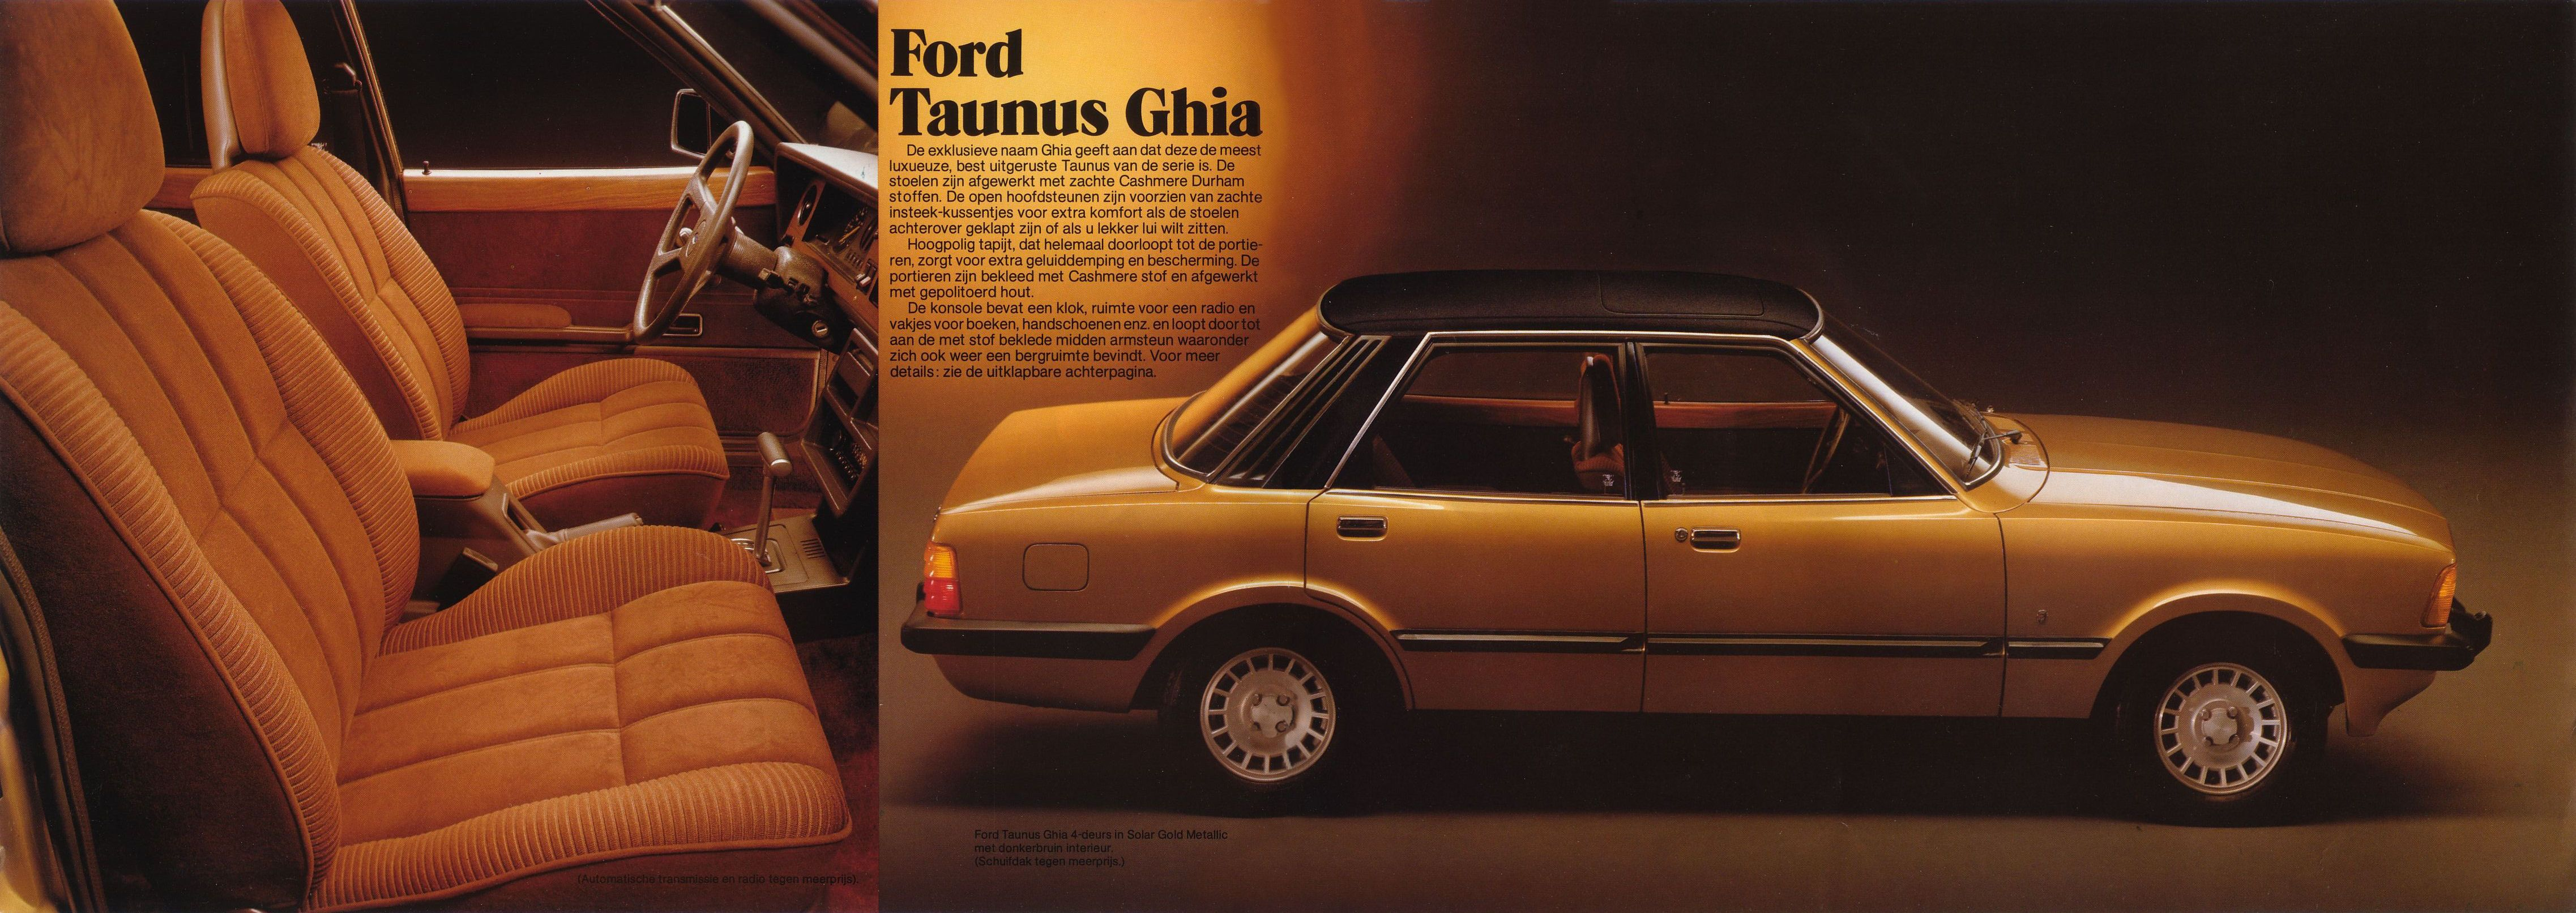 1979 Ford Taunusbrochure